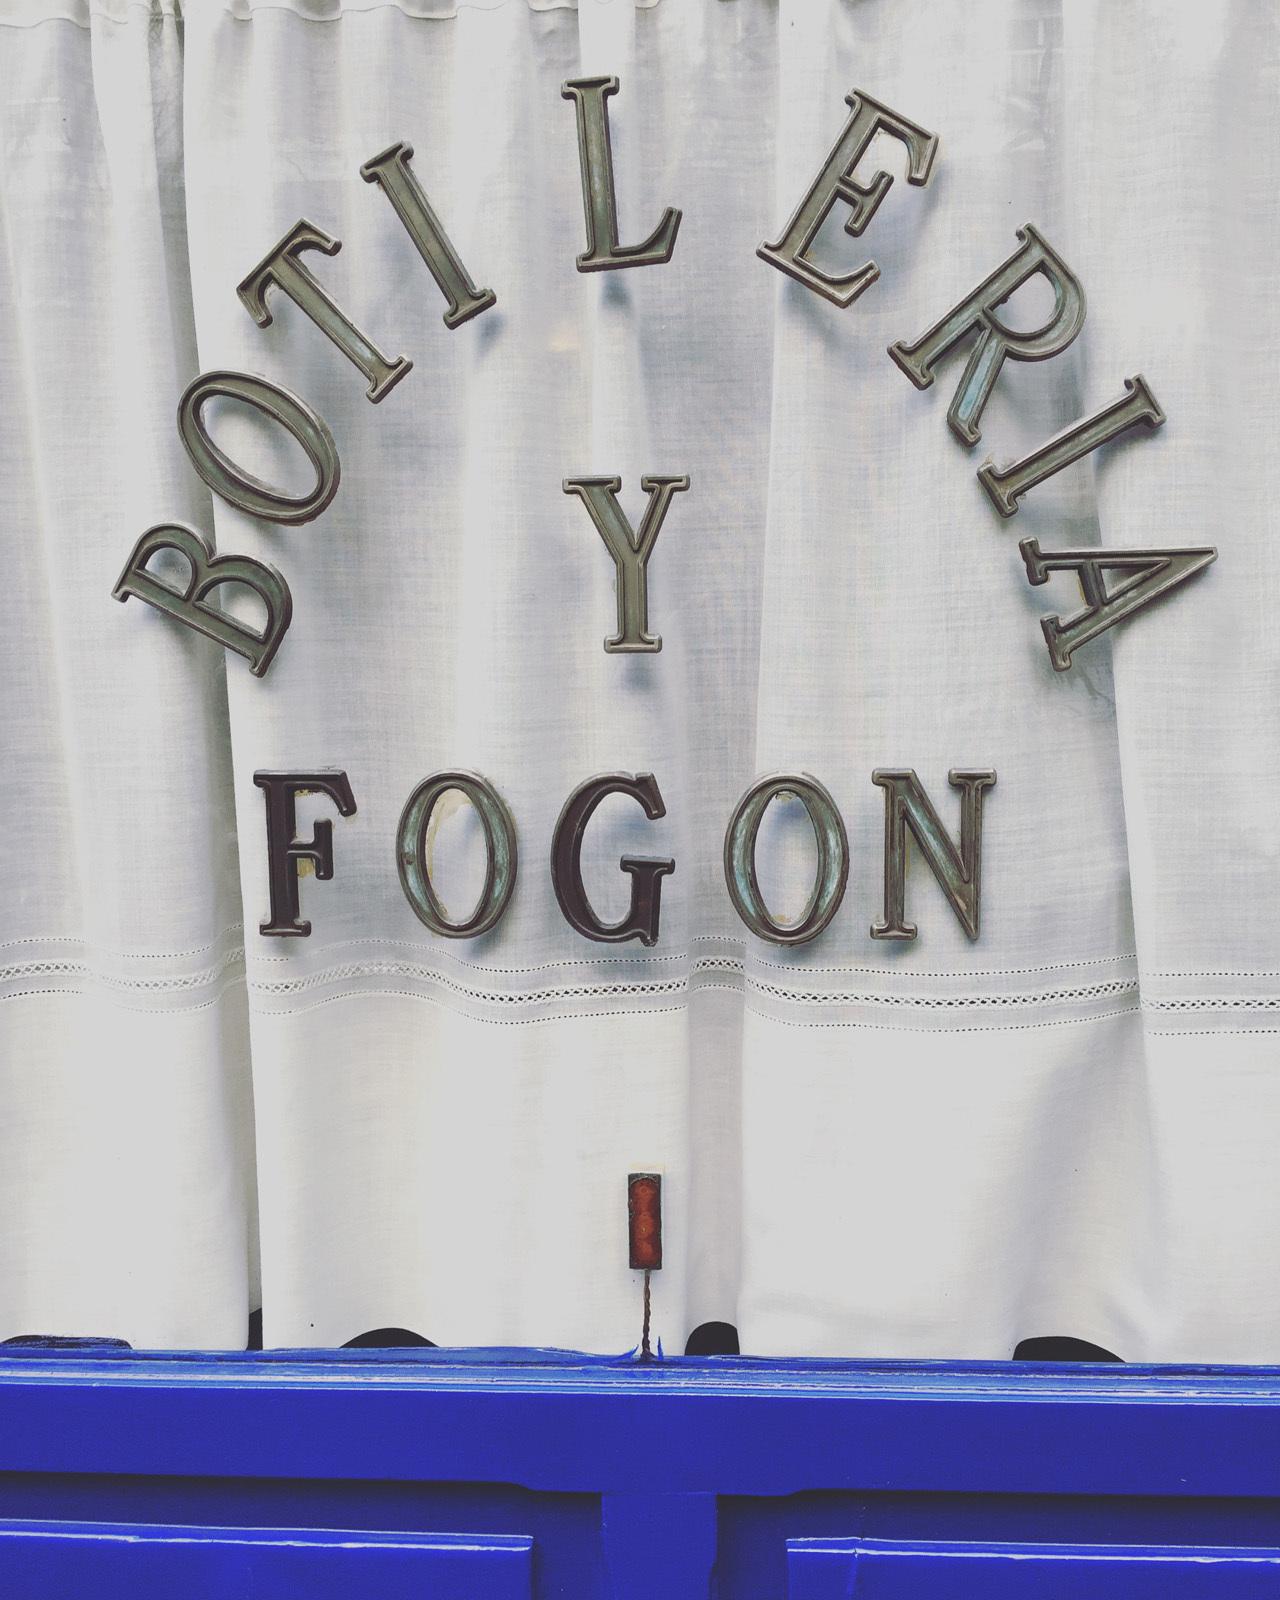 Sacha Botilleria y Fogon